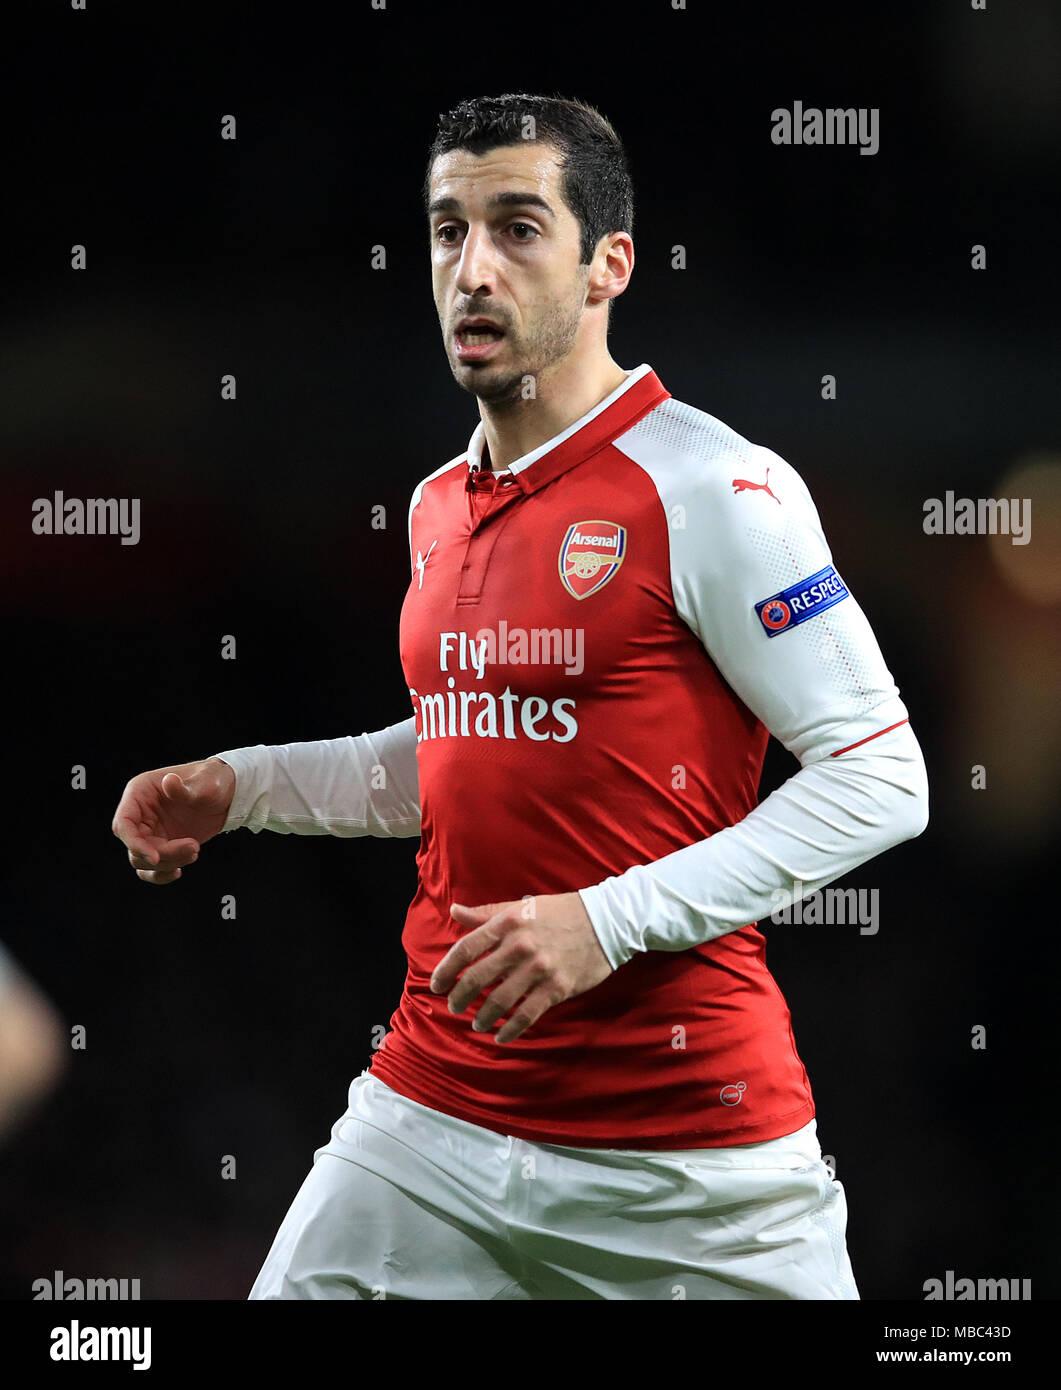 super popular 6148f 219c8 Henrikh Mkhitaryan, Arsenal Stock Photo: 179131553 - Alamy